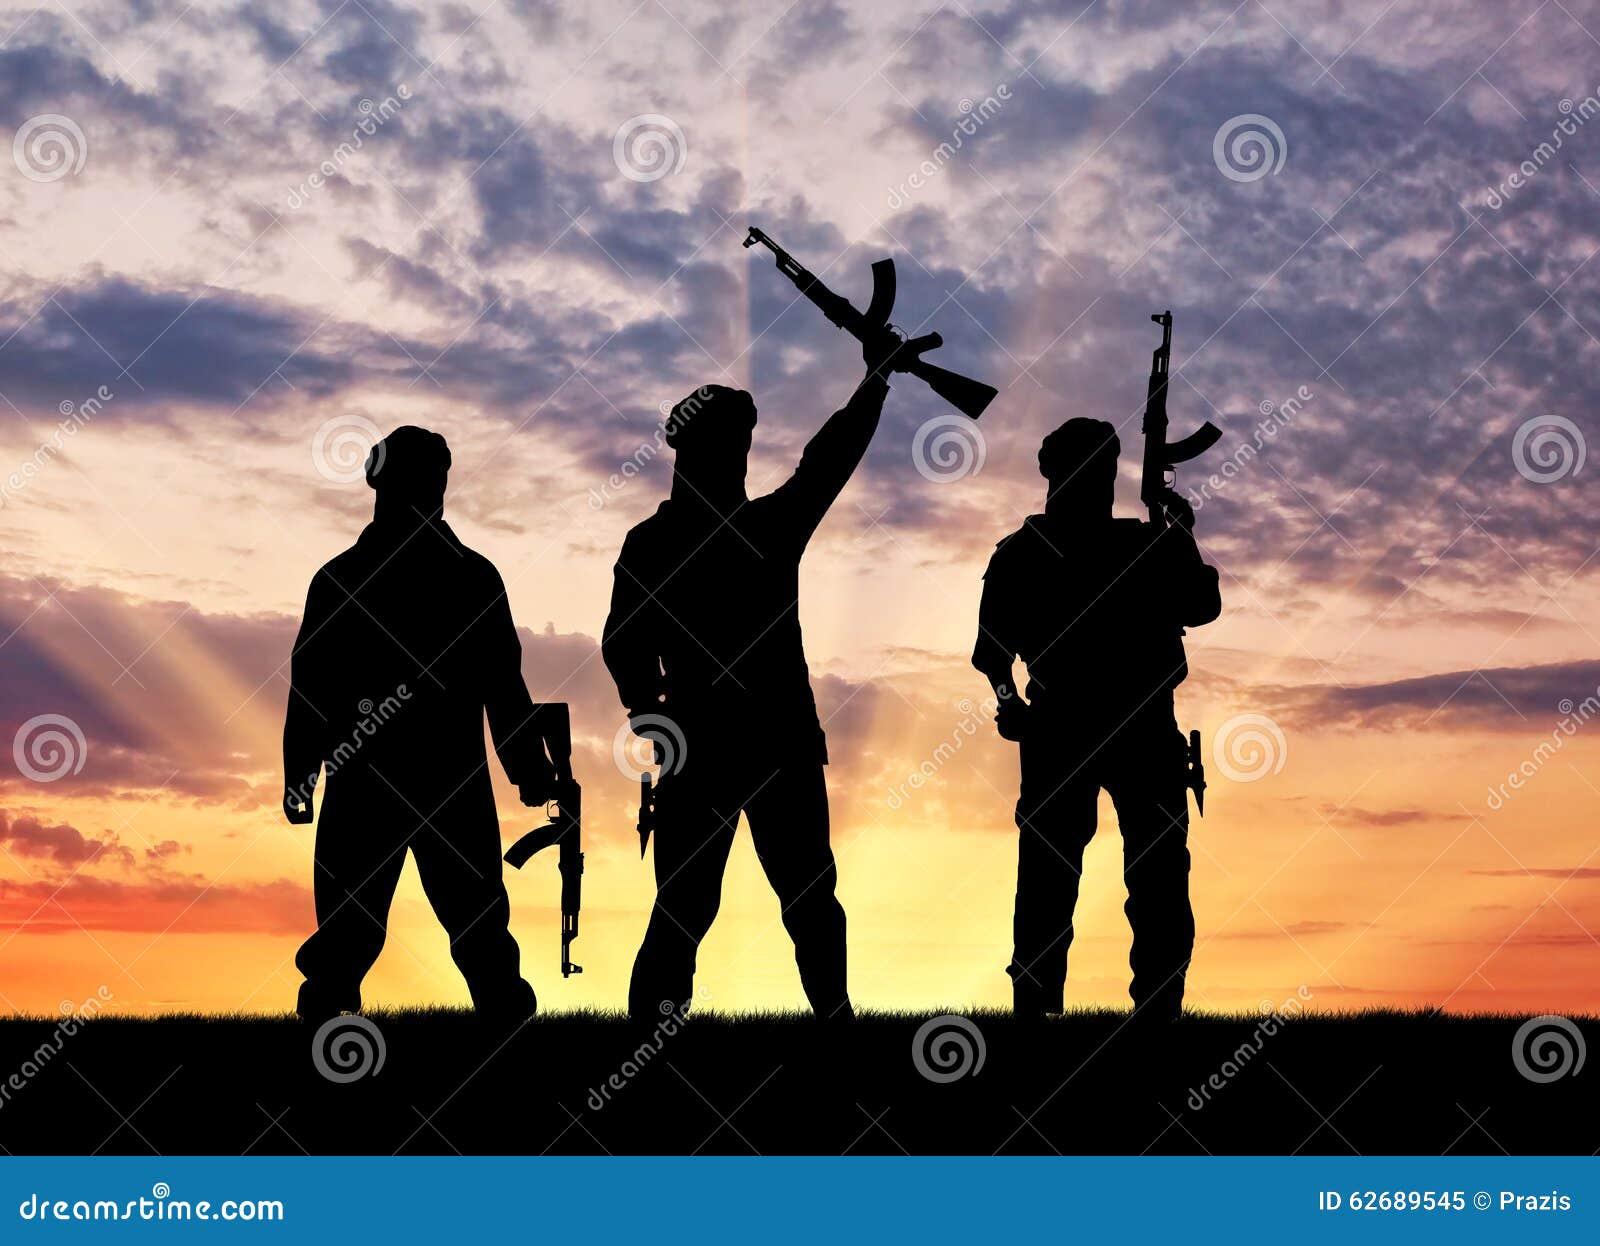 Terrorist Photo: Silhouette Of A Terrorists Stock Image. Image Of Iraq